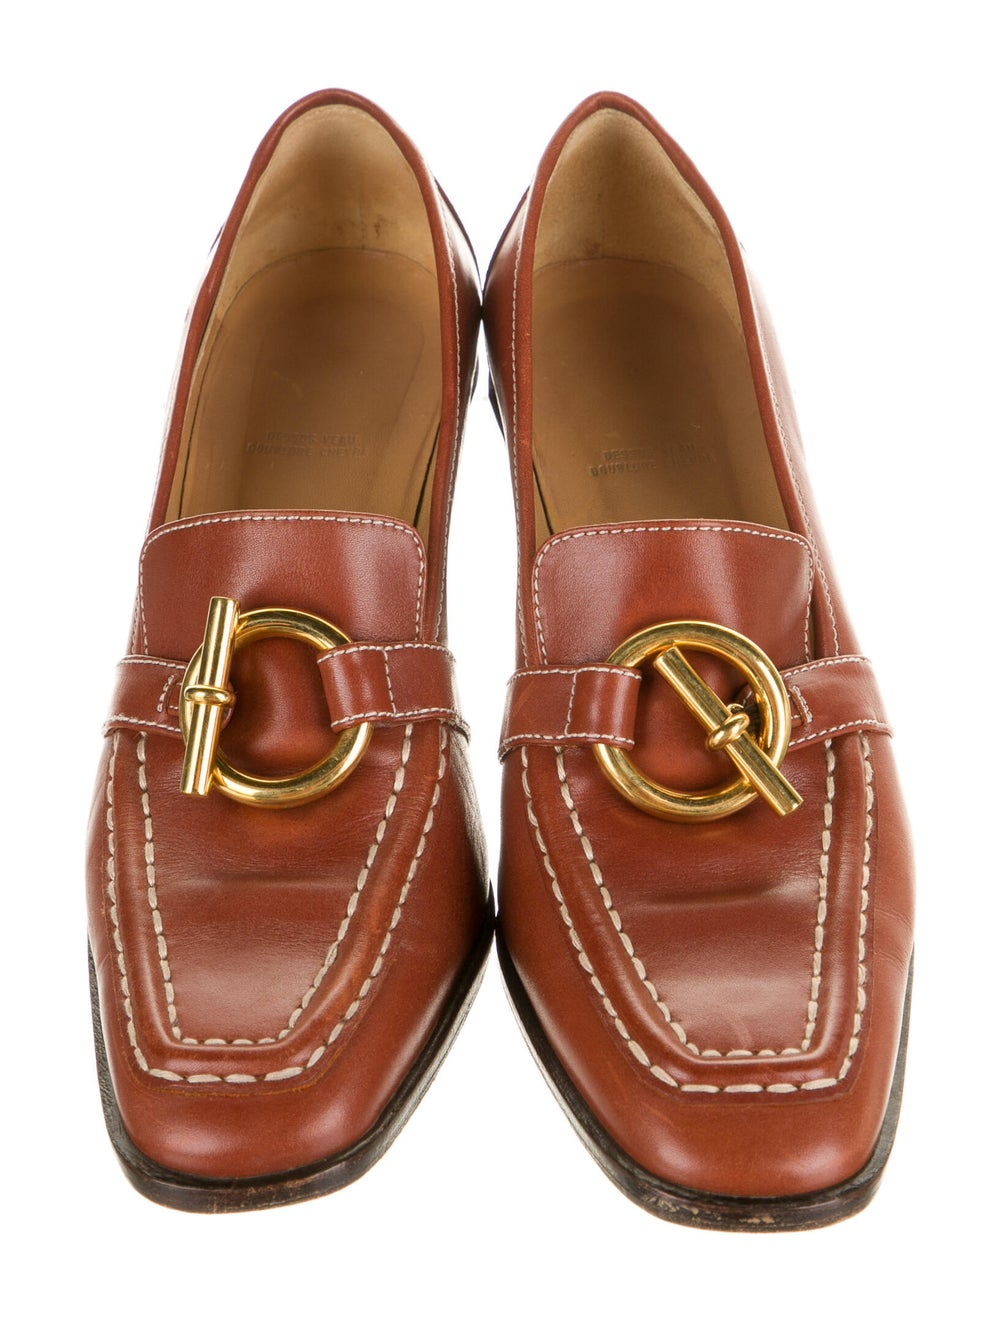 Hermès Vintage Leather Pumps - image 3